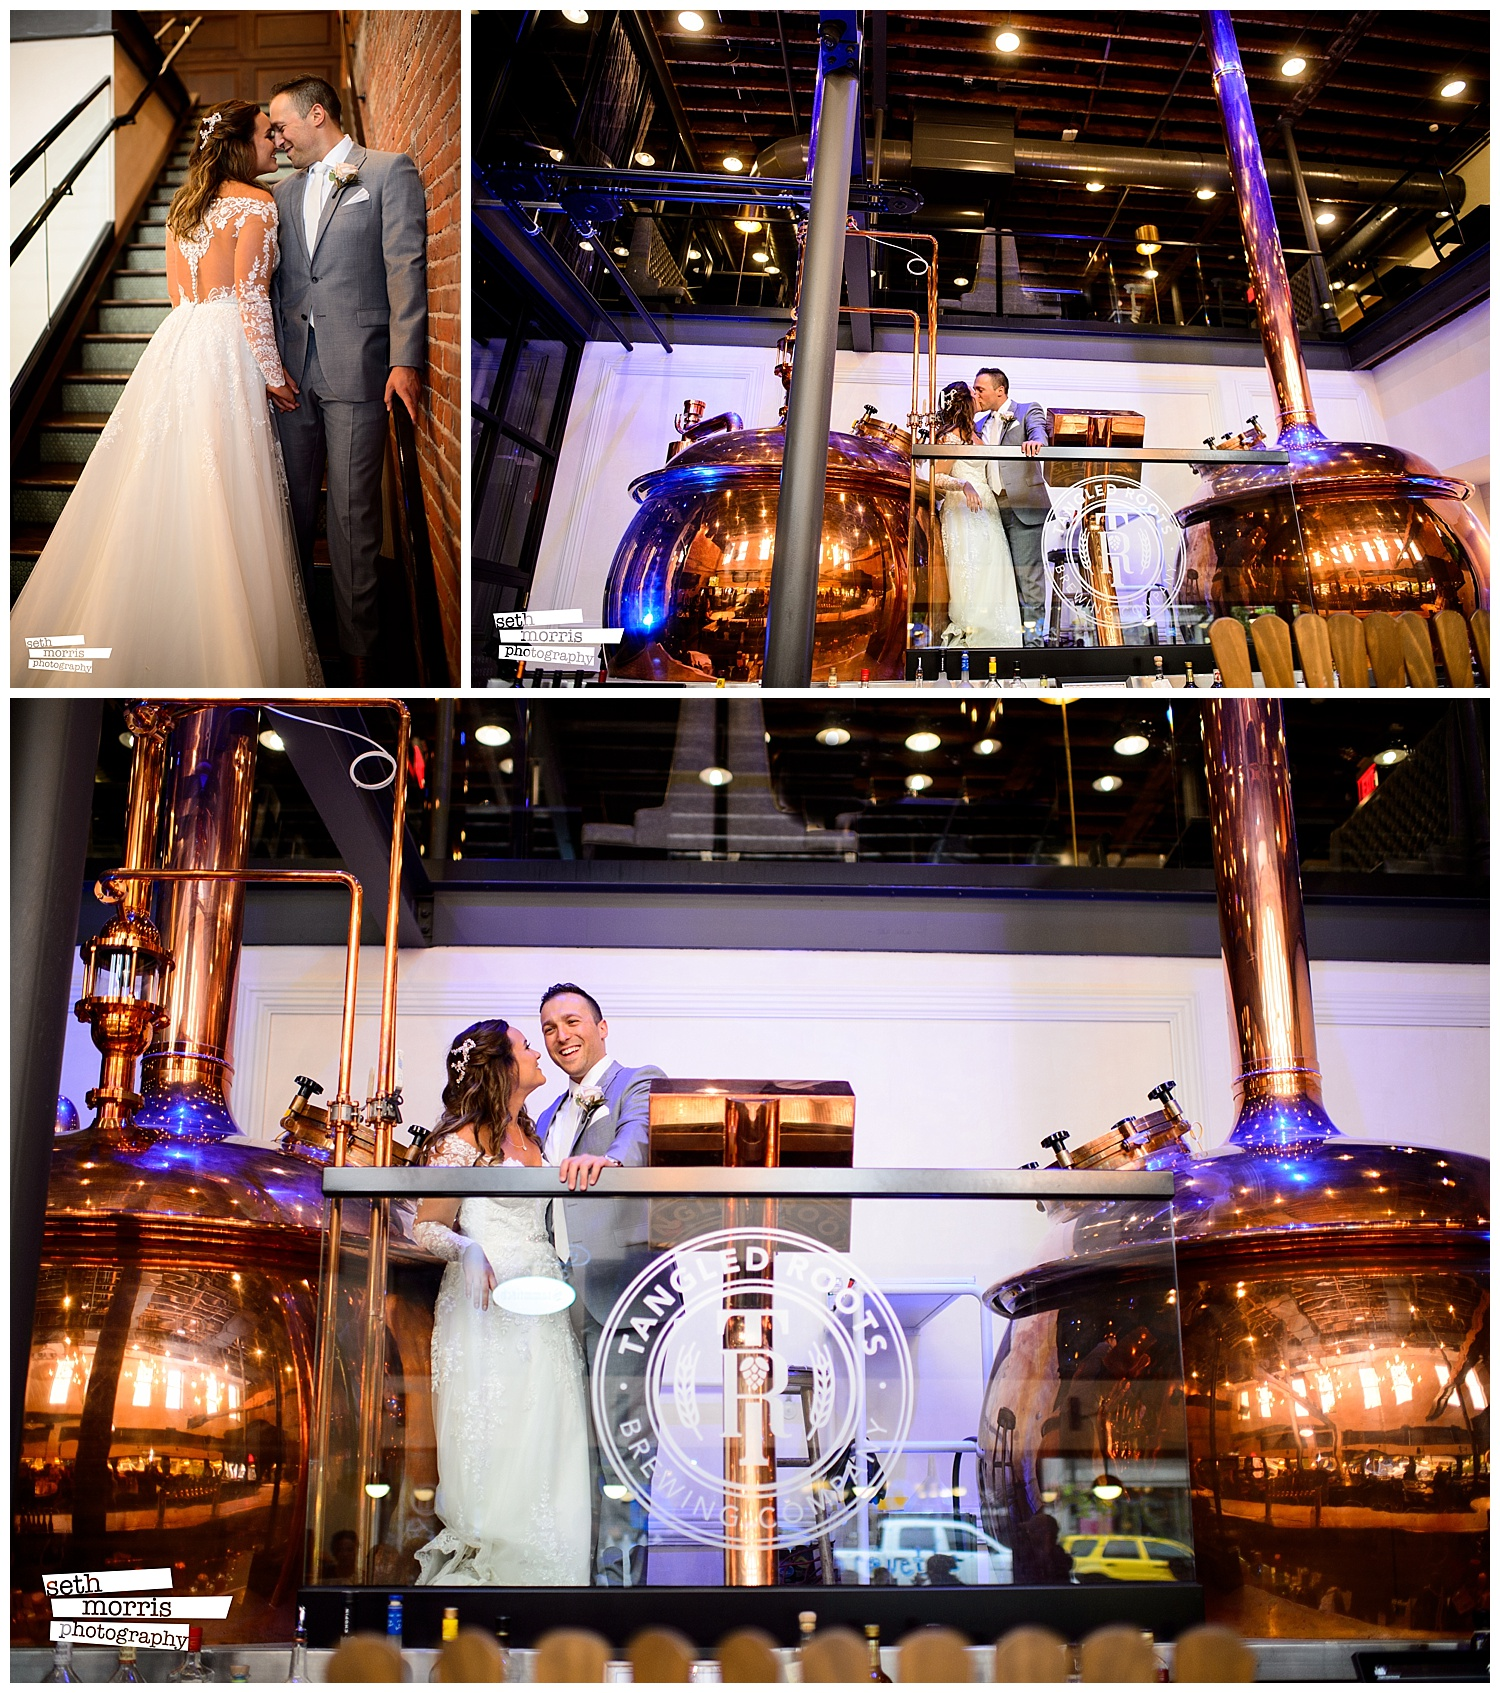 ottawa-tent-wedding-reception-rainy wedding-pictures-46.jpg